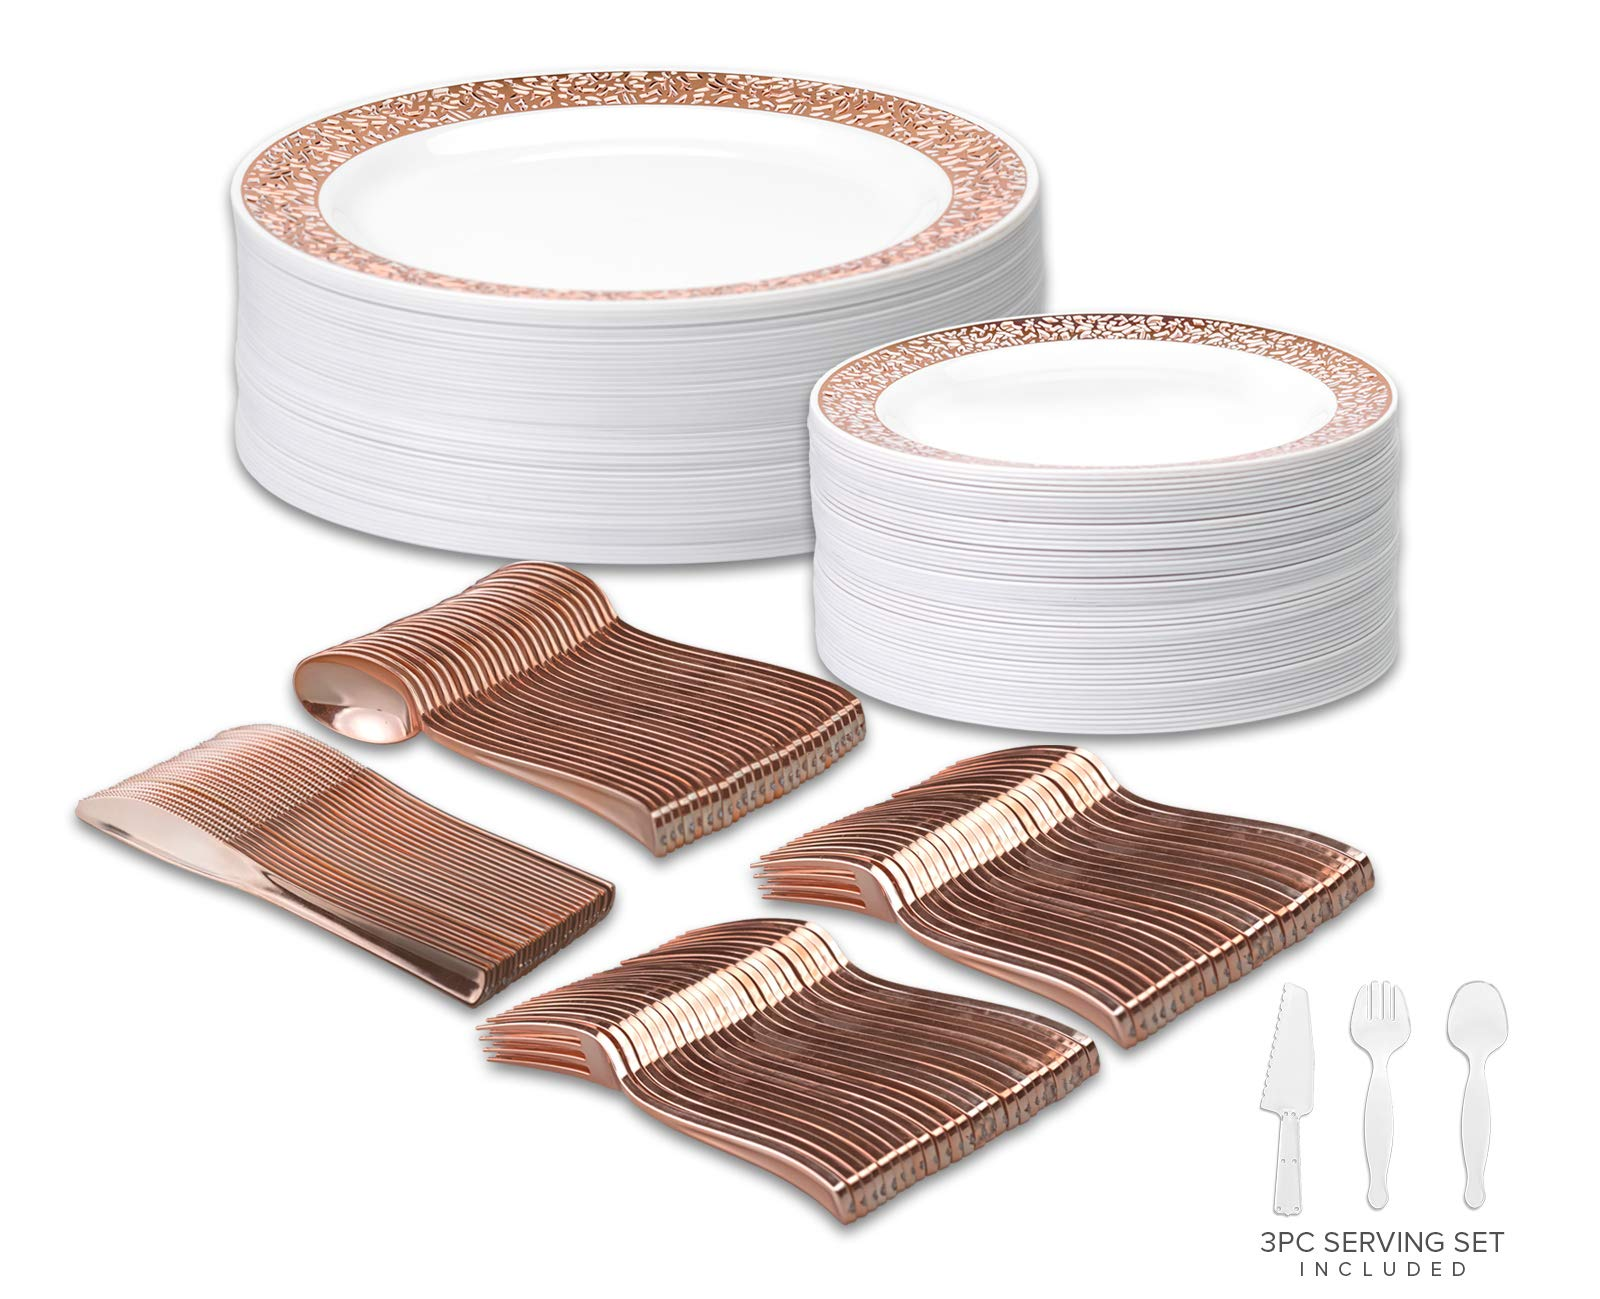 Your Gatherings - 606pc/100 Guest Rose Gold Premium Disposable Wedding Dinnerware Set | 100 Dinner Plates, 100 Dessert Plates, 200 Forks, 100 Spoons, 100 Knives (100 Guest Set, Rose Gold)